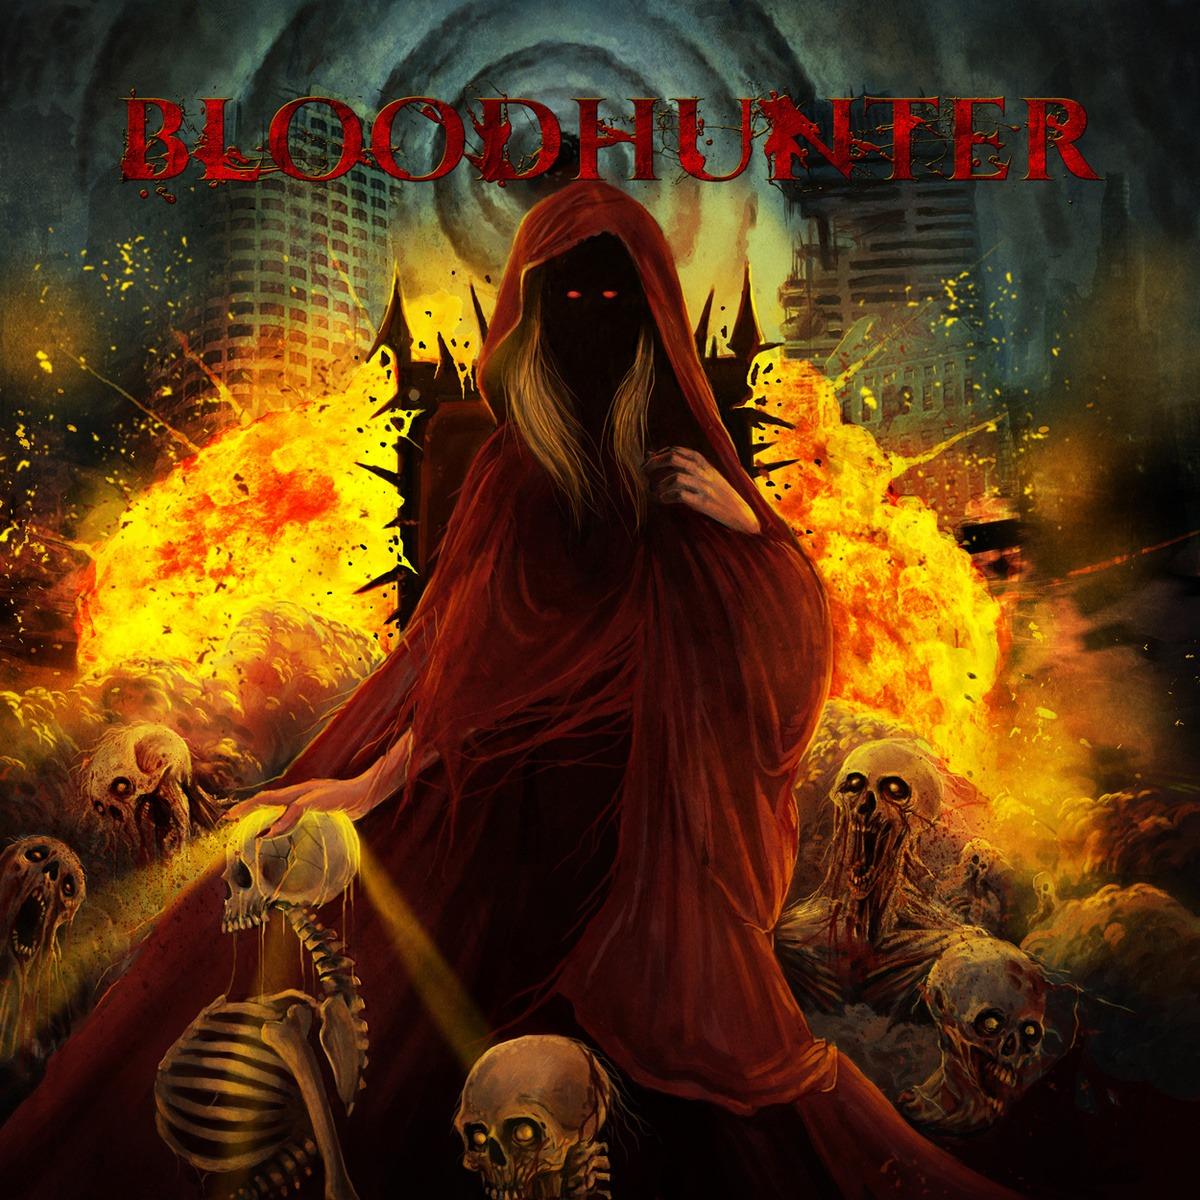 BLOODHUNTER – Bloodhunter, 2014